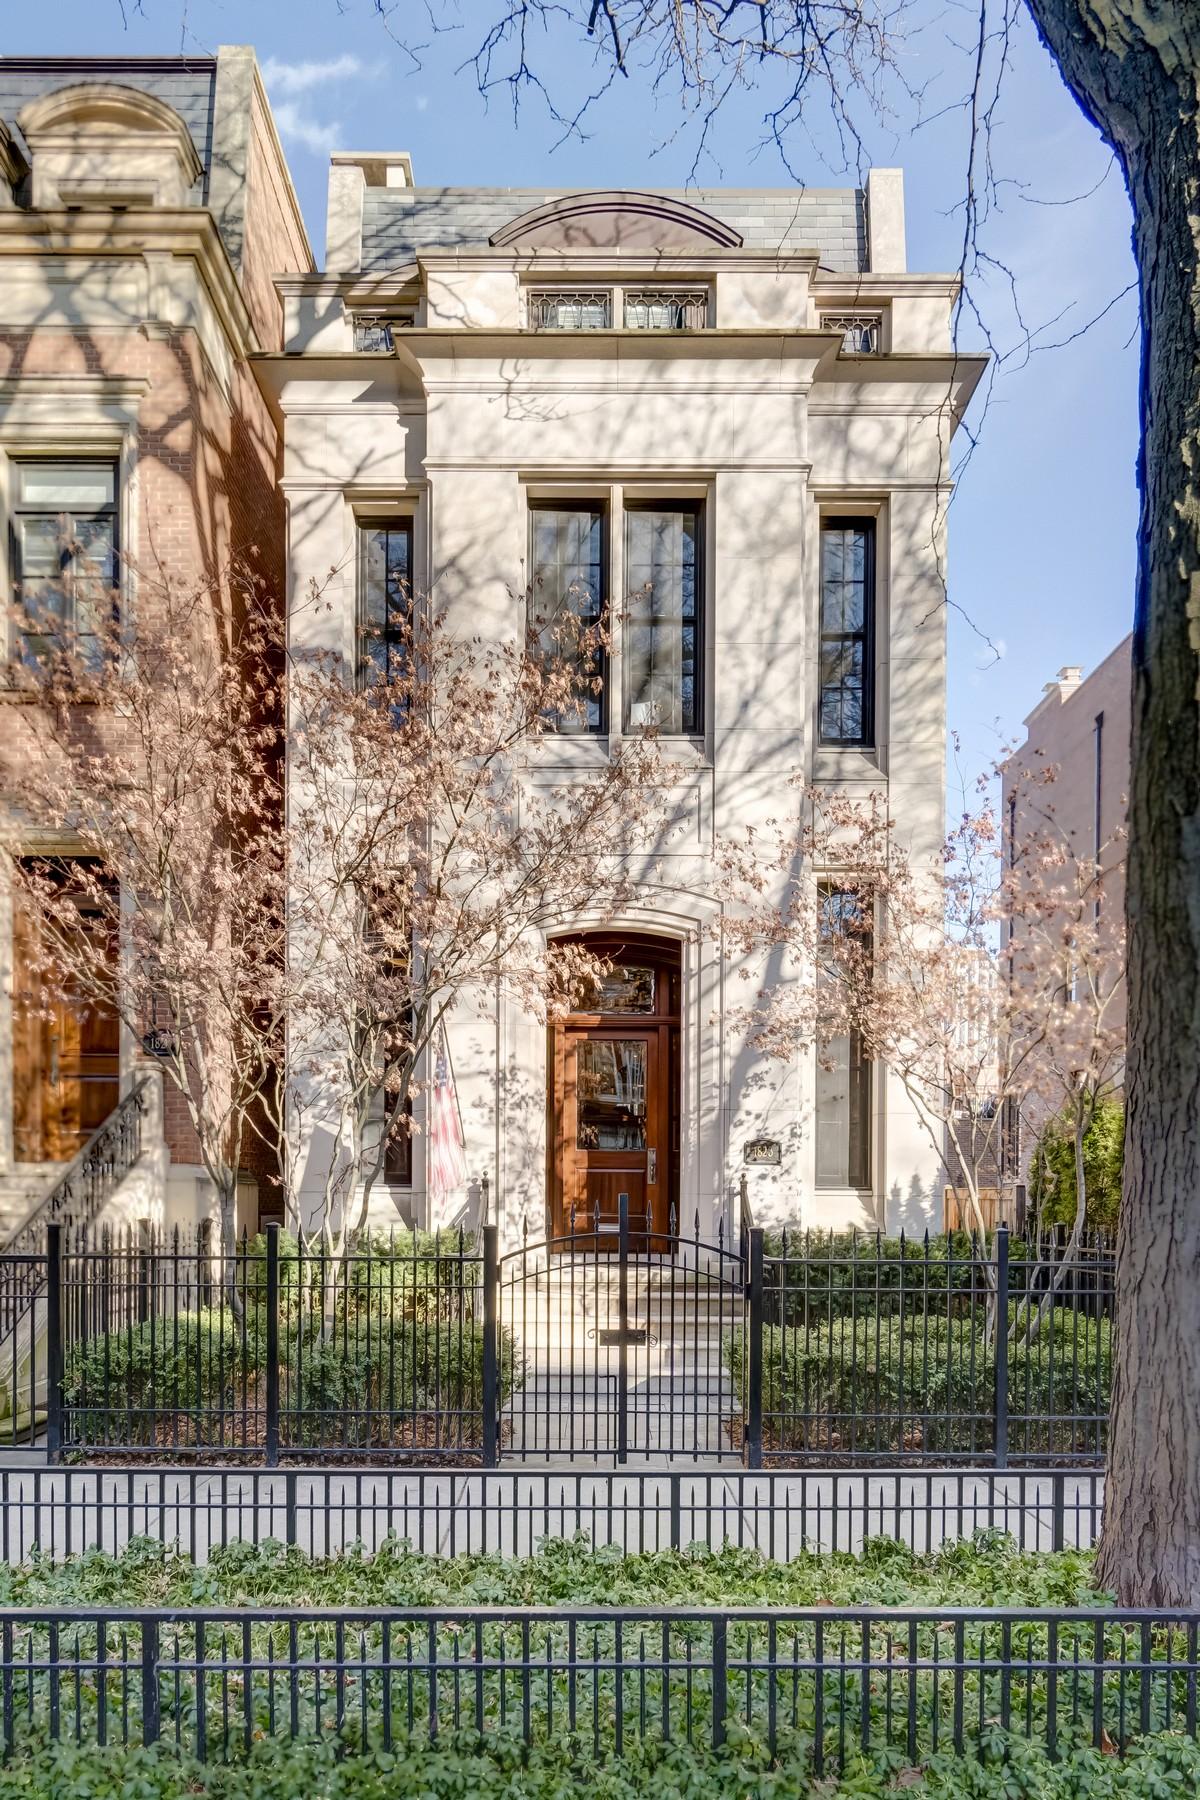 Частный односемейный дом для того Продажа на Exclusive Metzler Hull East Lincoln Park Home 1823 N Cleveland Avenue Near North Side, Chicago, Иллинойс, 60614 Соединенные Штаты